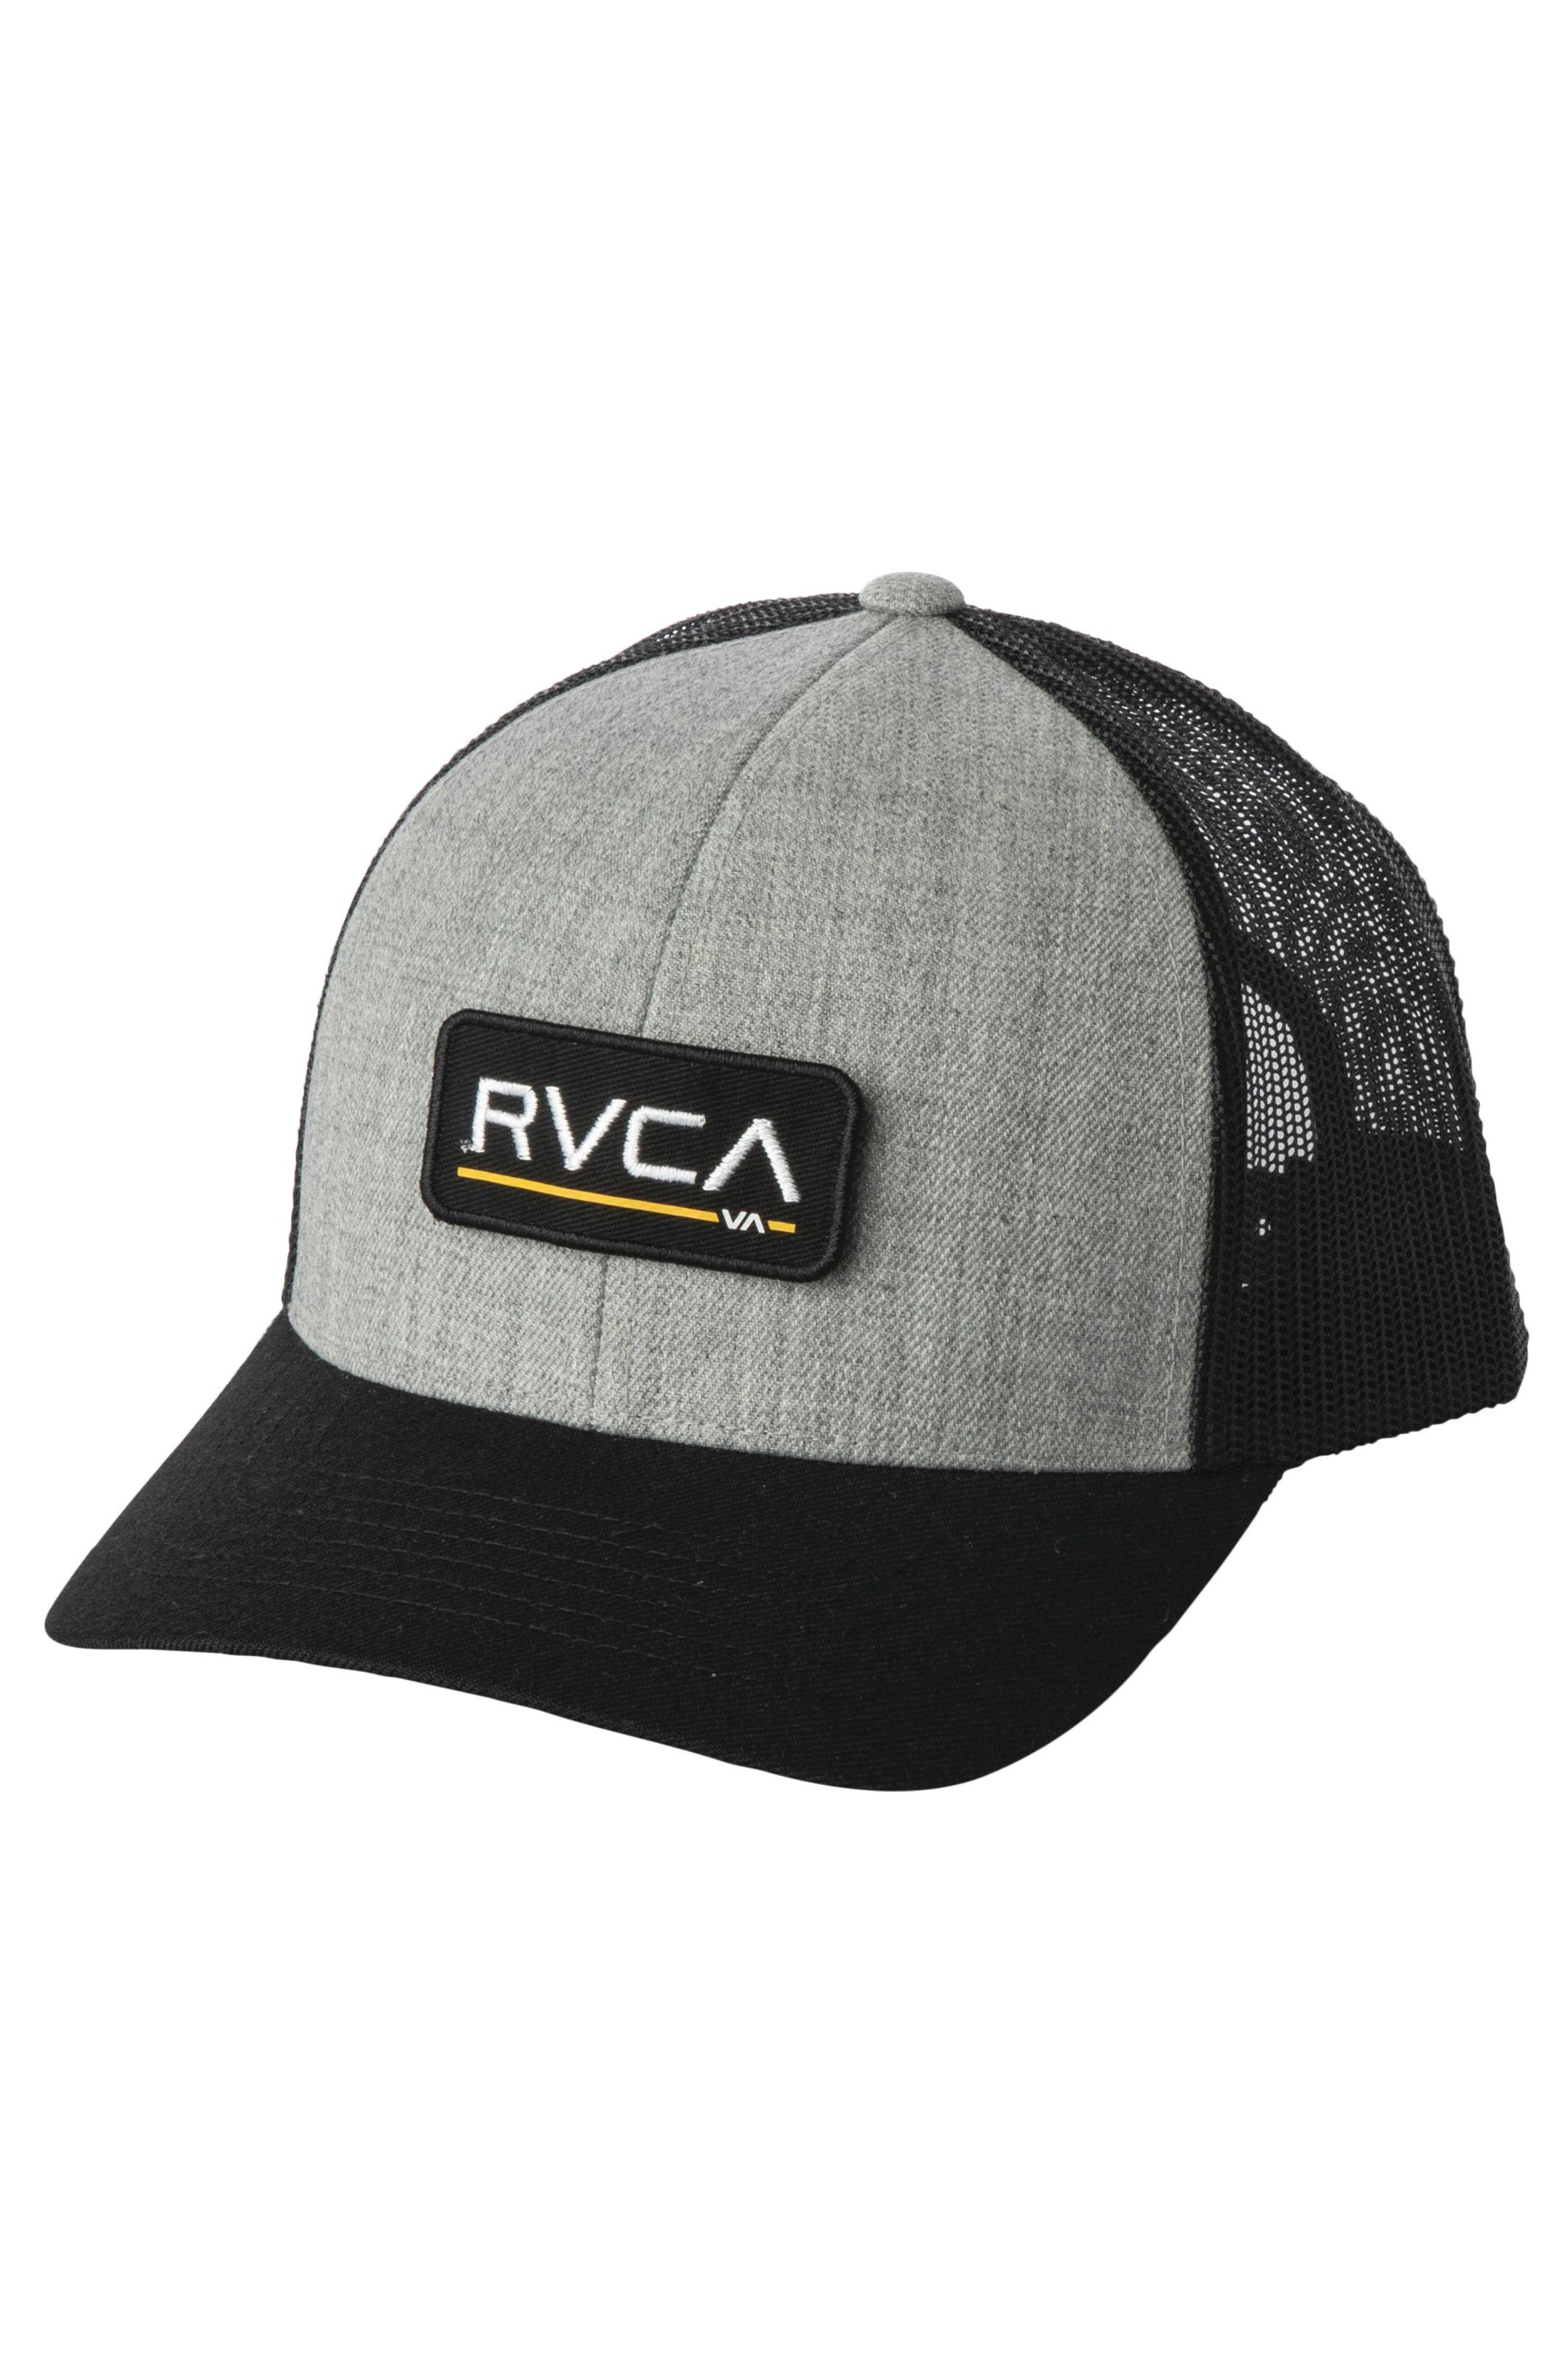 RVCA Cap   TICKET TRUCKER III B Hthr Grey/Black